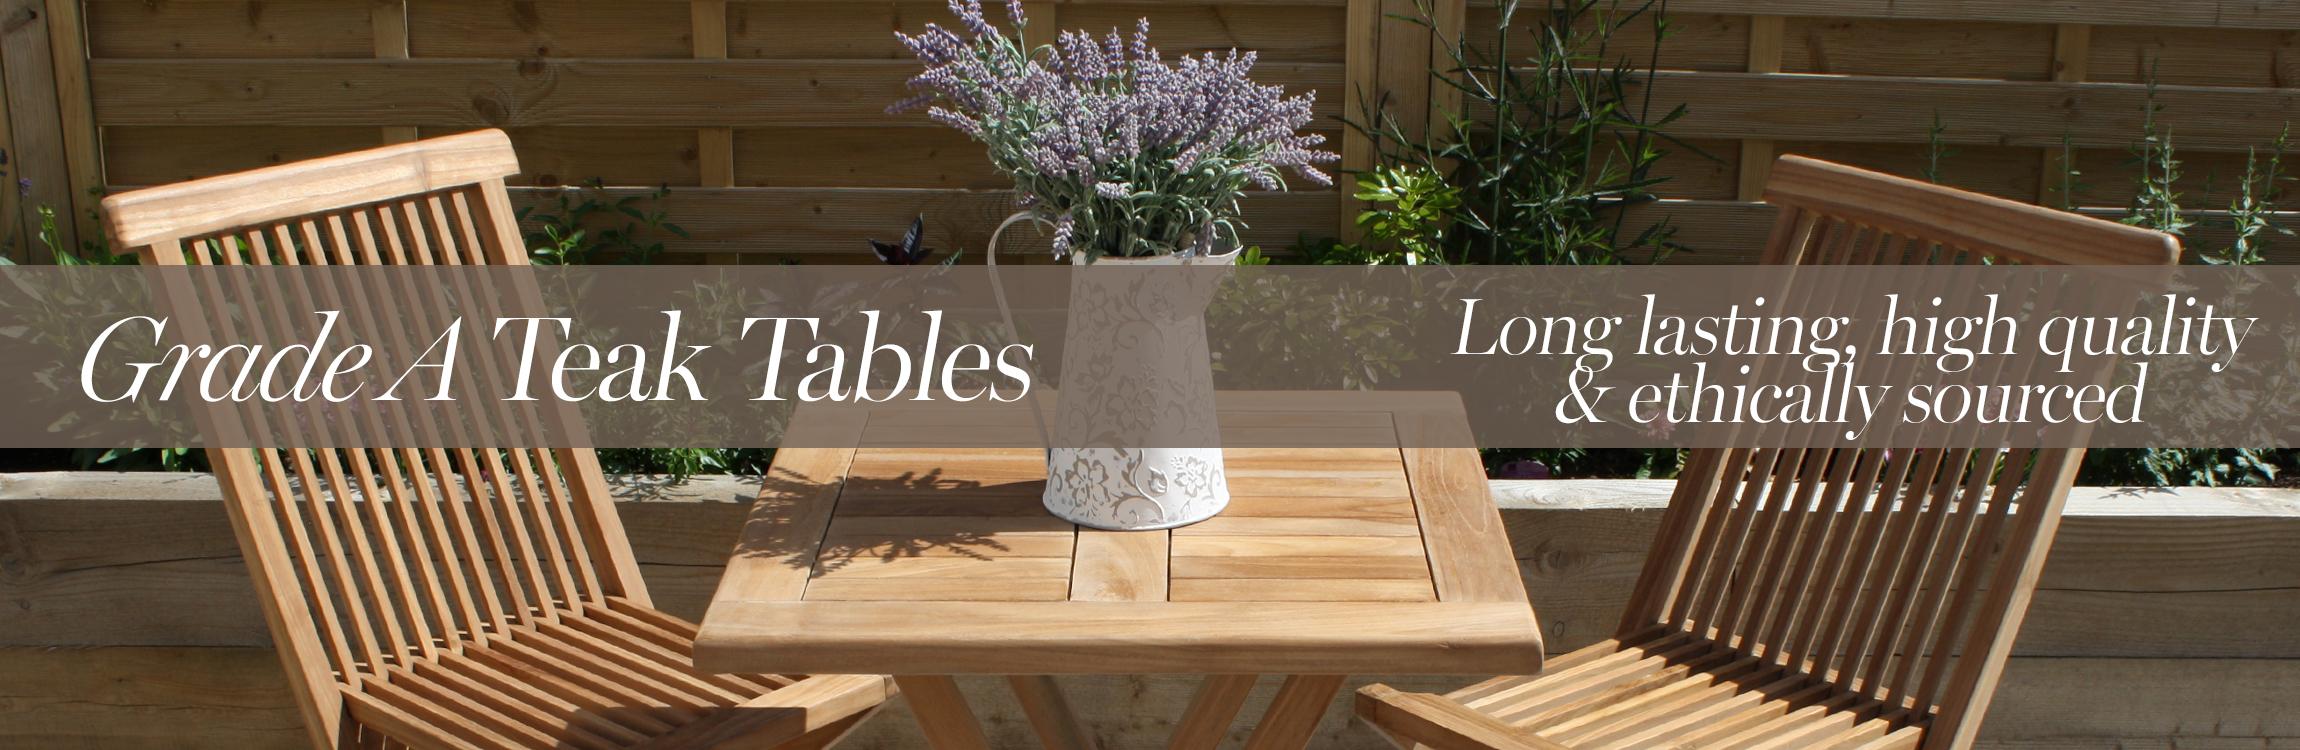 Grade A Teak Tables